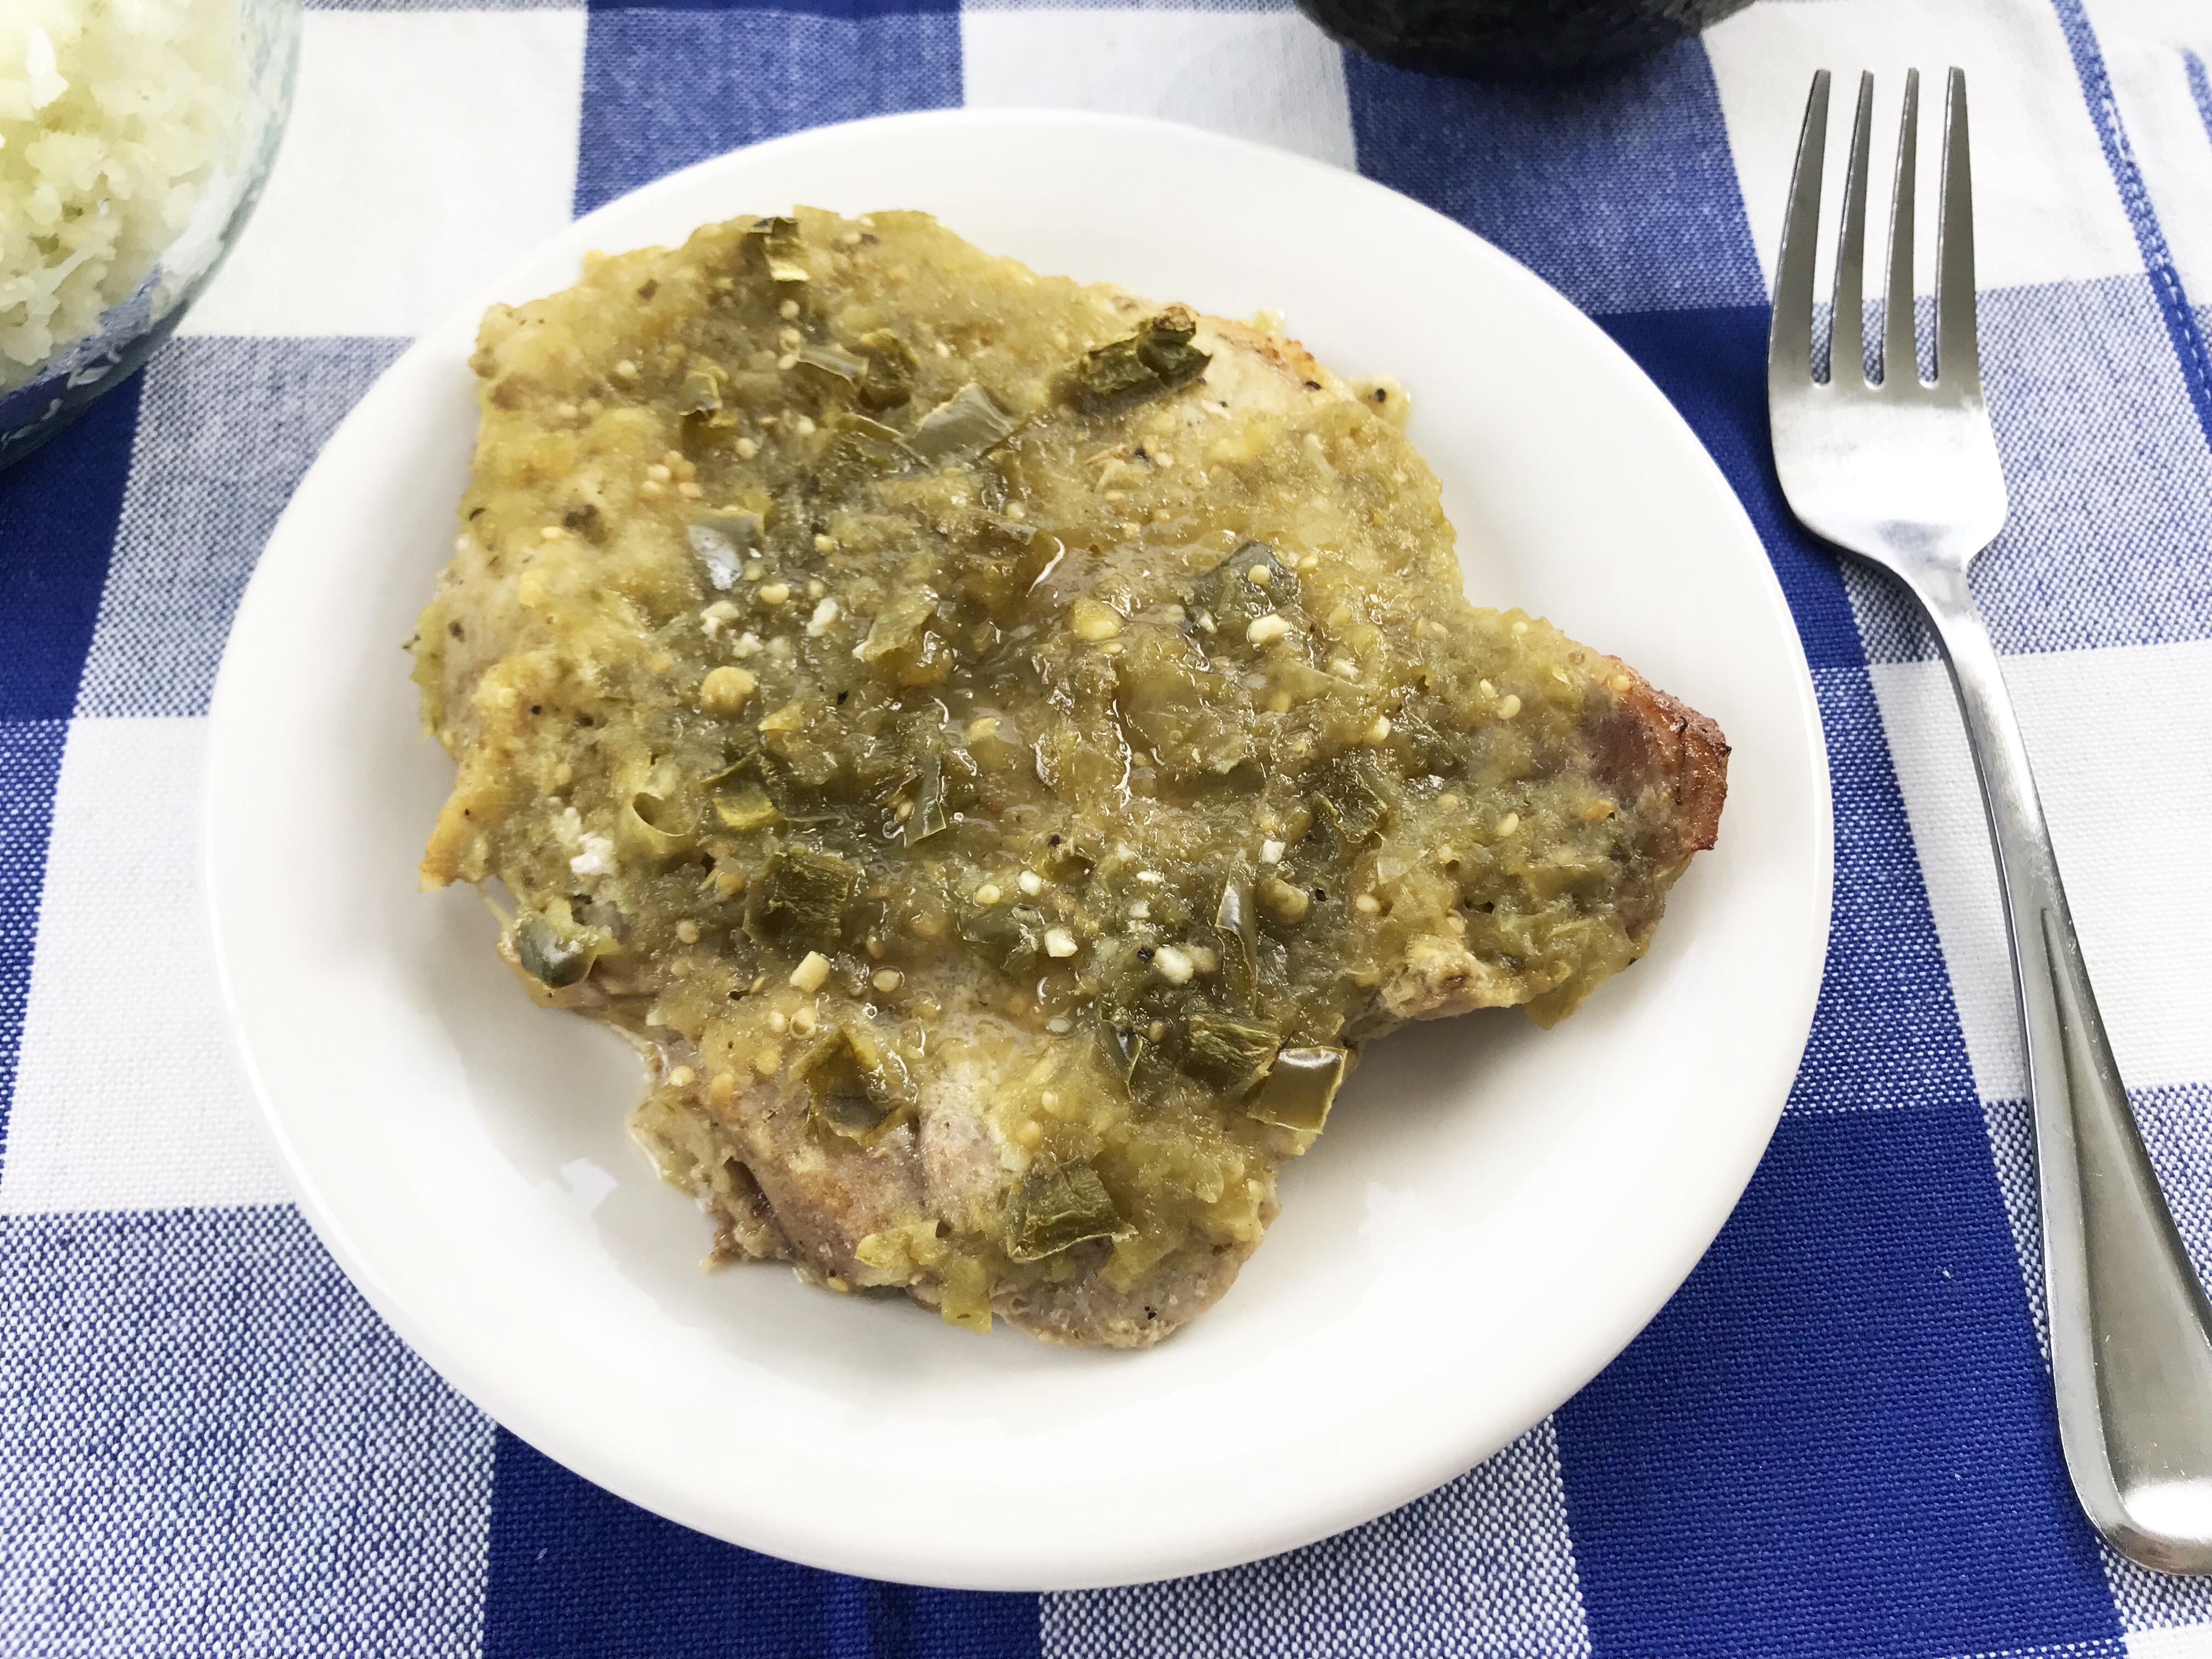 Salsa verde pork chops, pork chops recipe, boneless pork chops recipe, pork, salsa verde